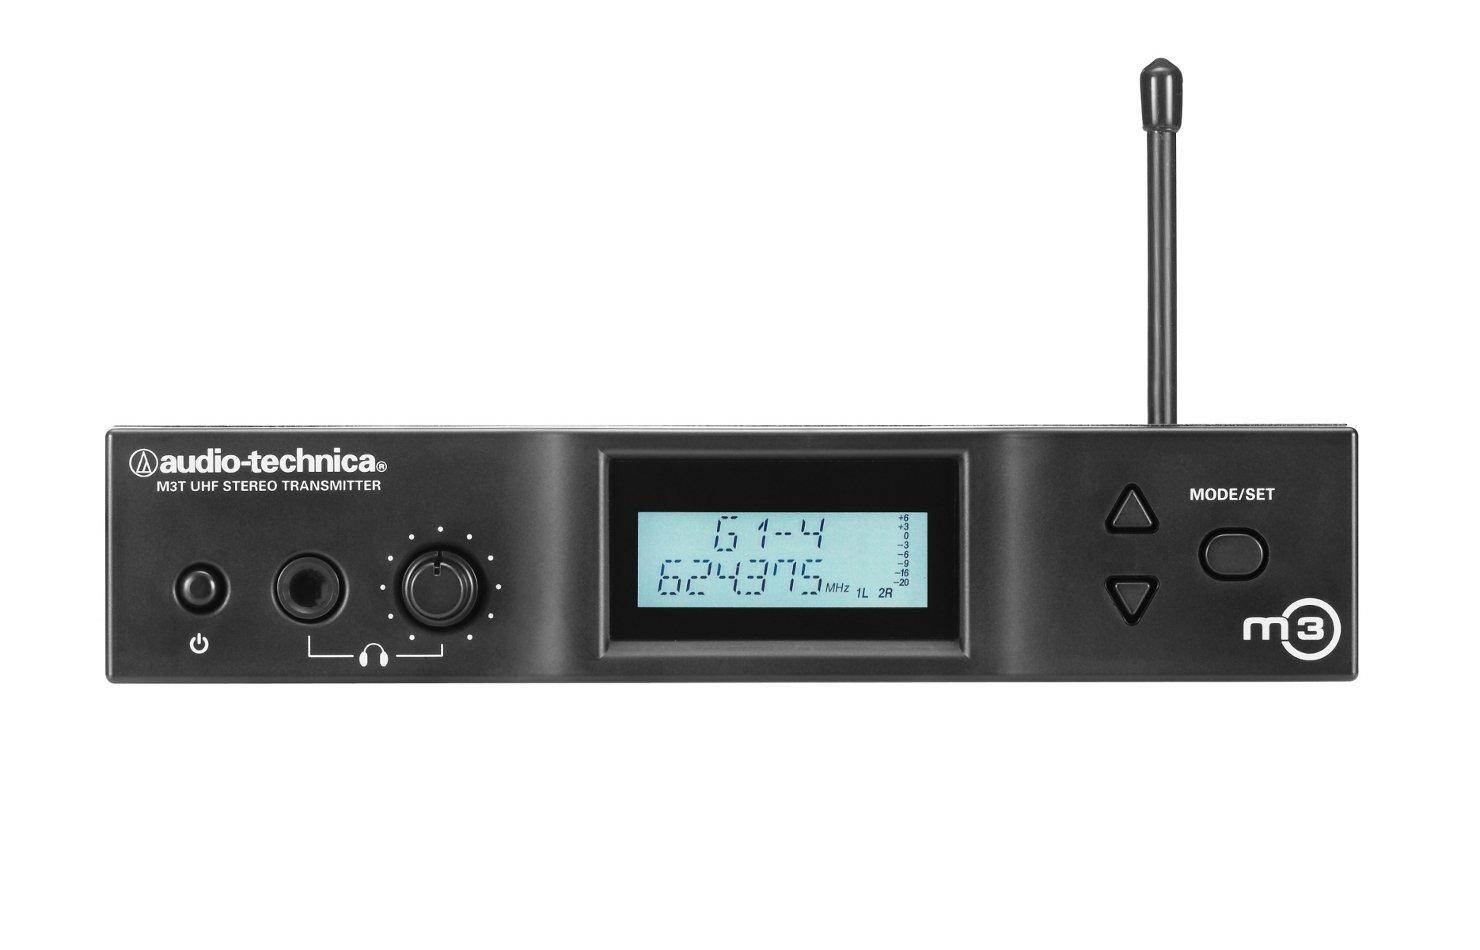 Transmitter, M3 Wireless System, Stereo